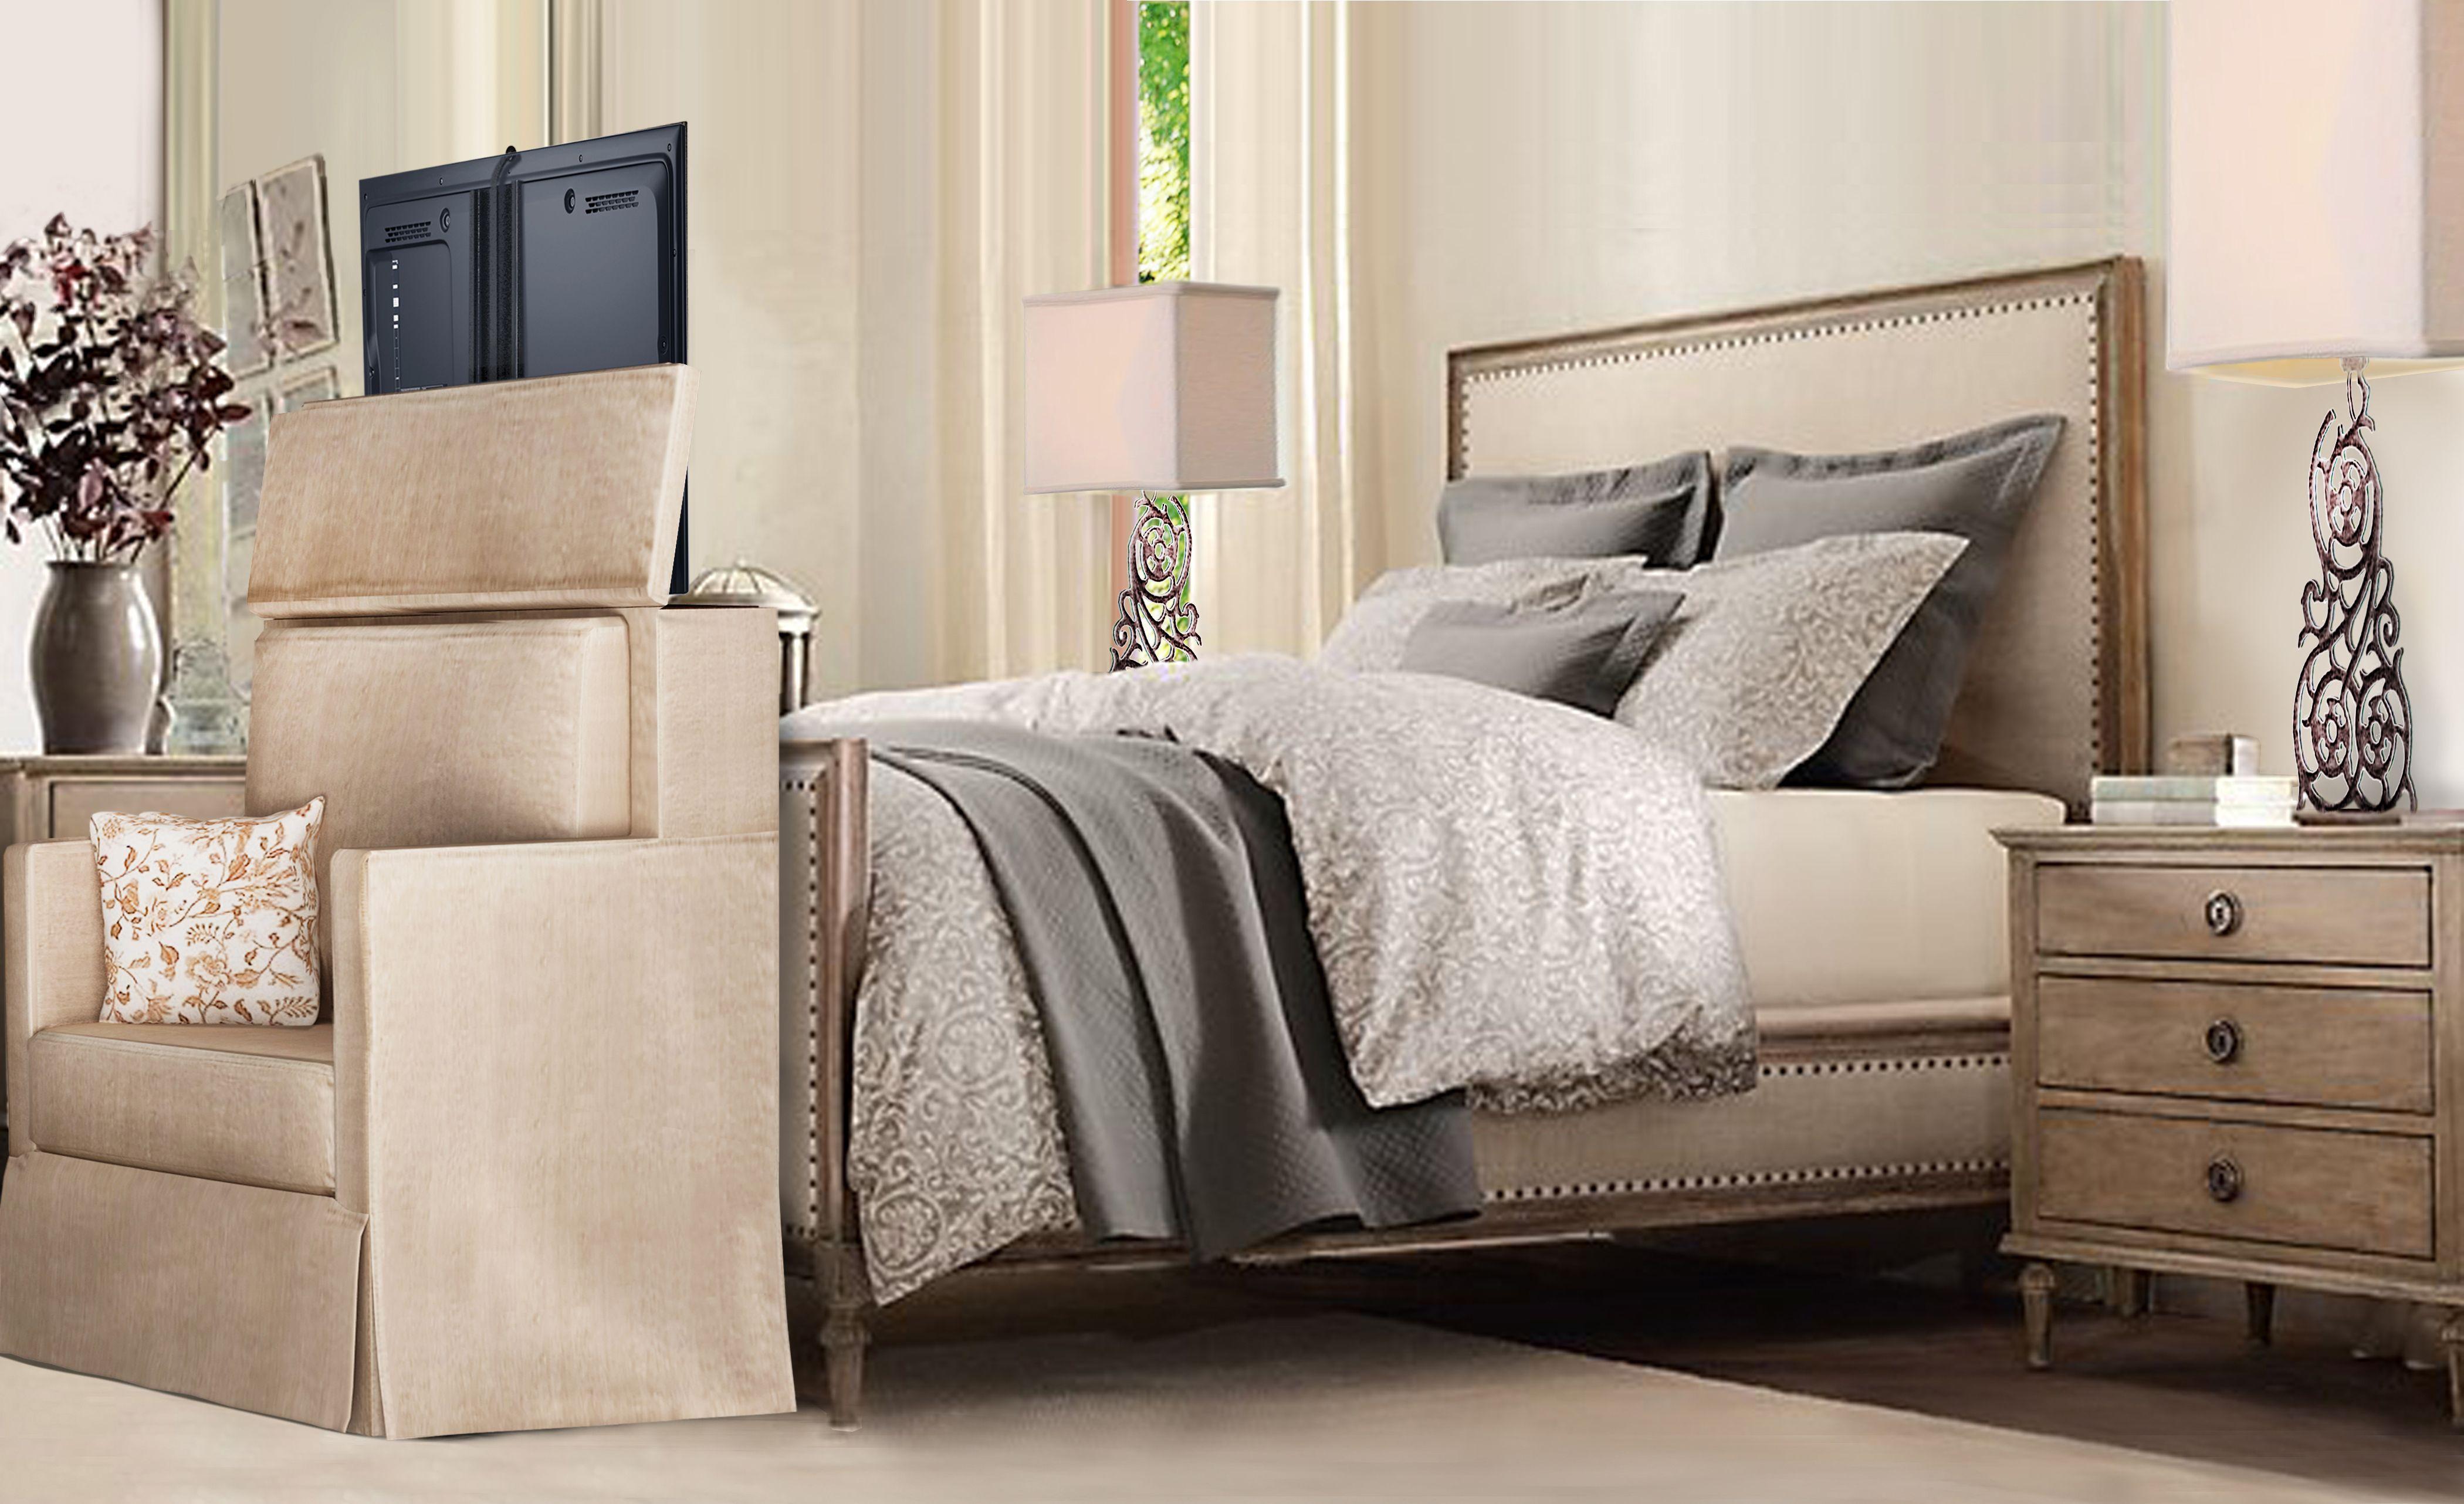 Custom sofa with TV Lift Home bedroom, Tv lift